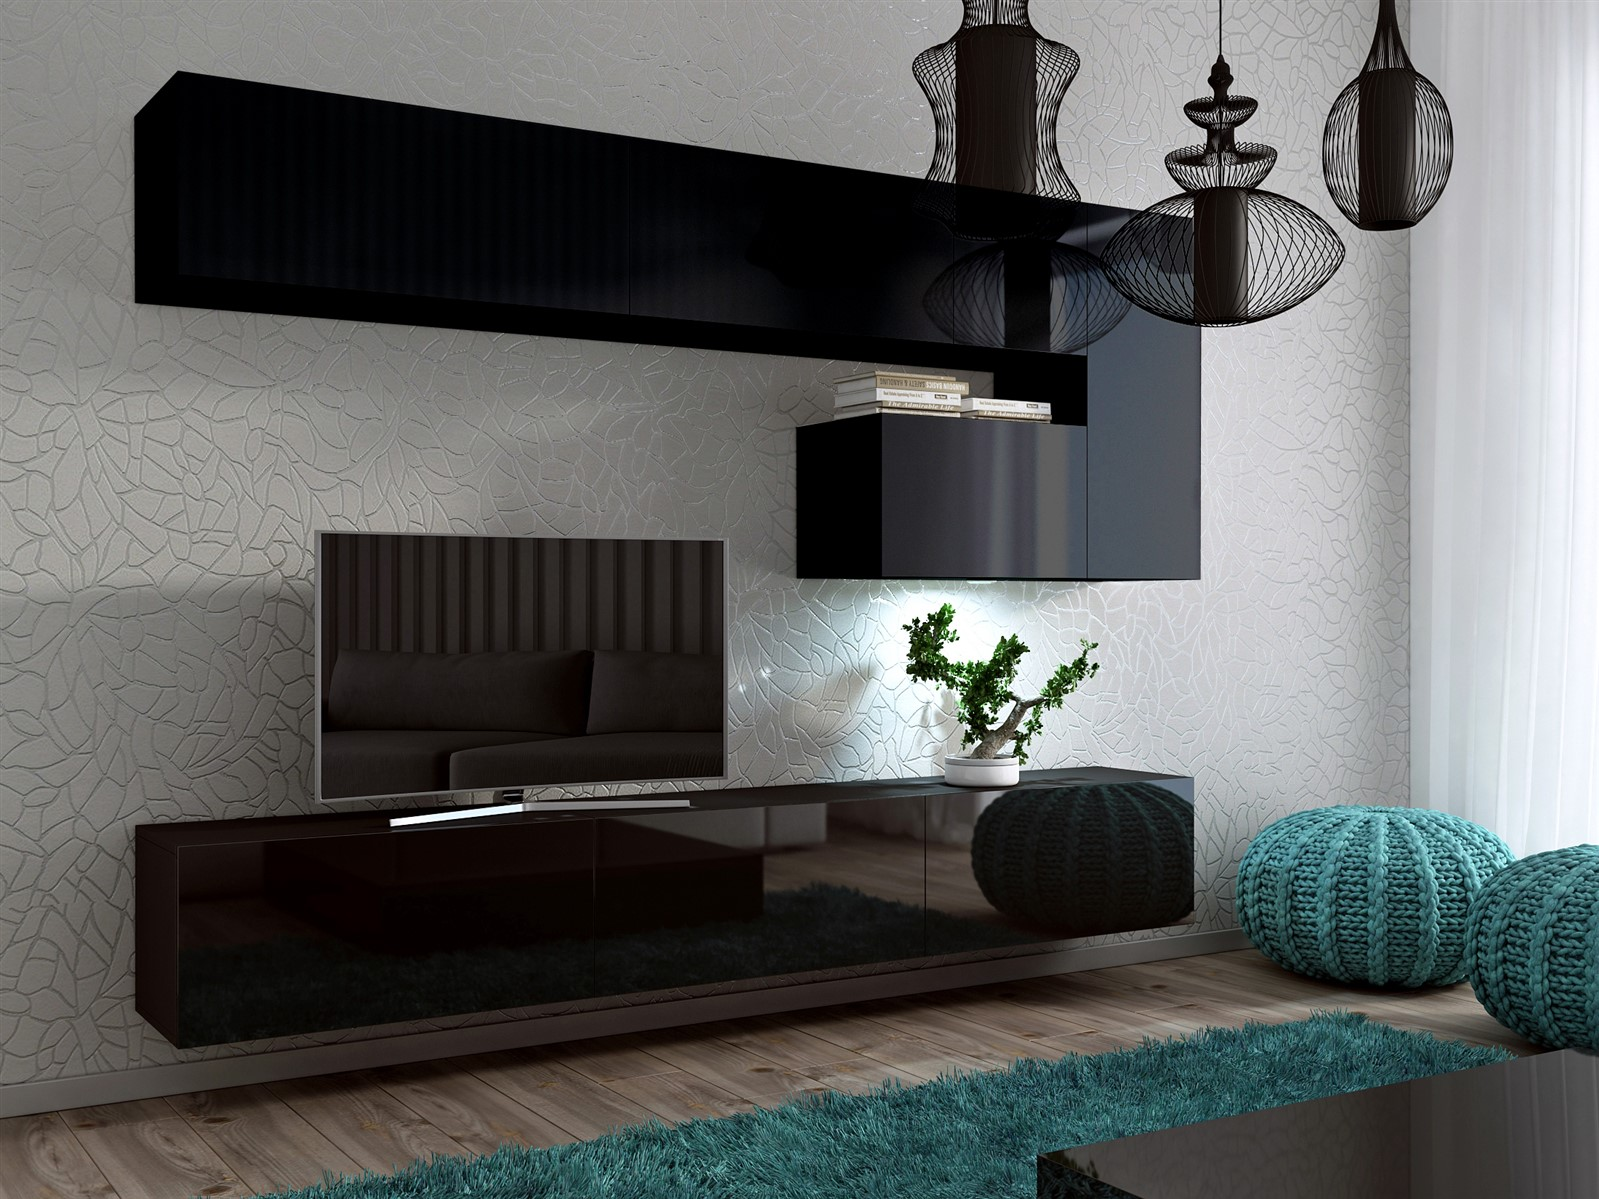 Mediawand Wohnwand 8 Tlg  Konzept 15  Schwarz HGL Mit LED Beleuchtung